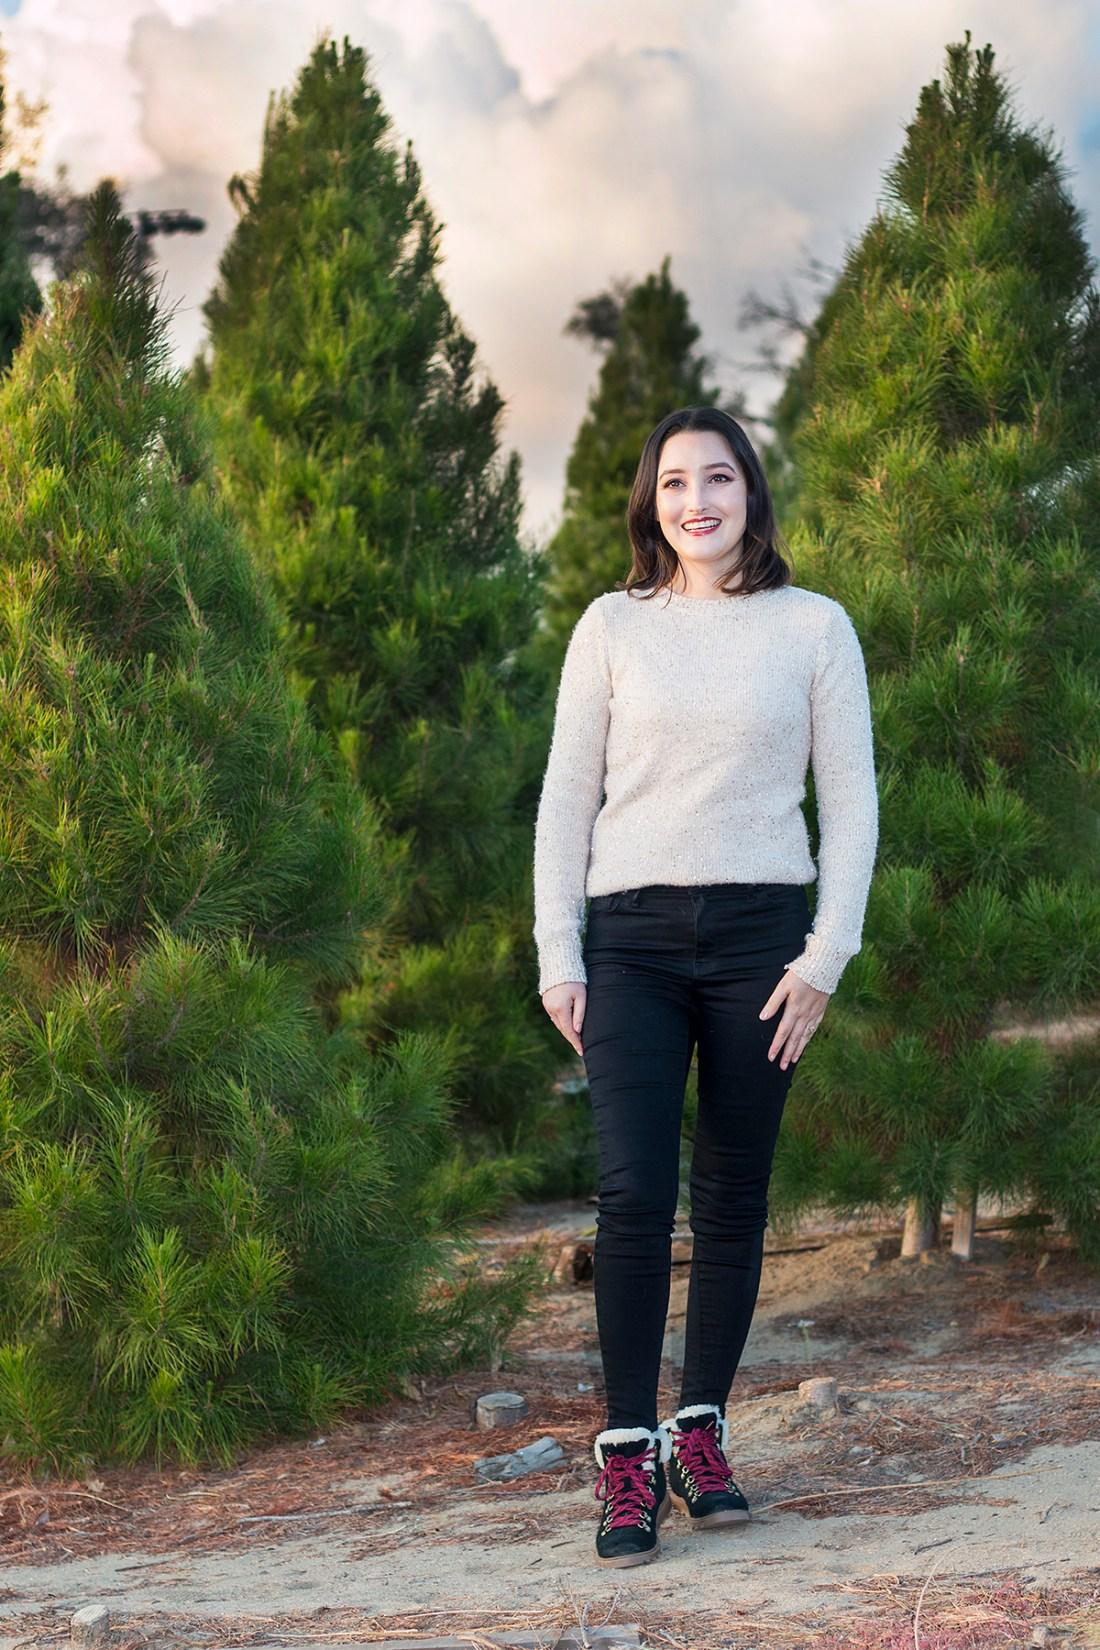 Christmas Conifers Christmas Tree Farm | A Good Hue